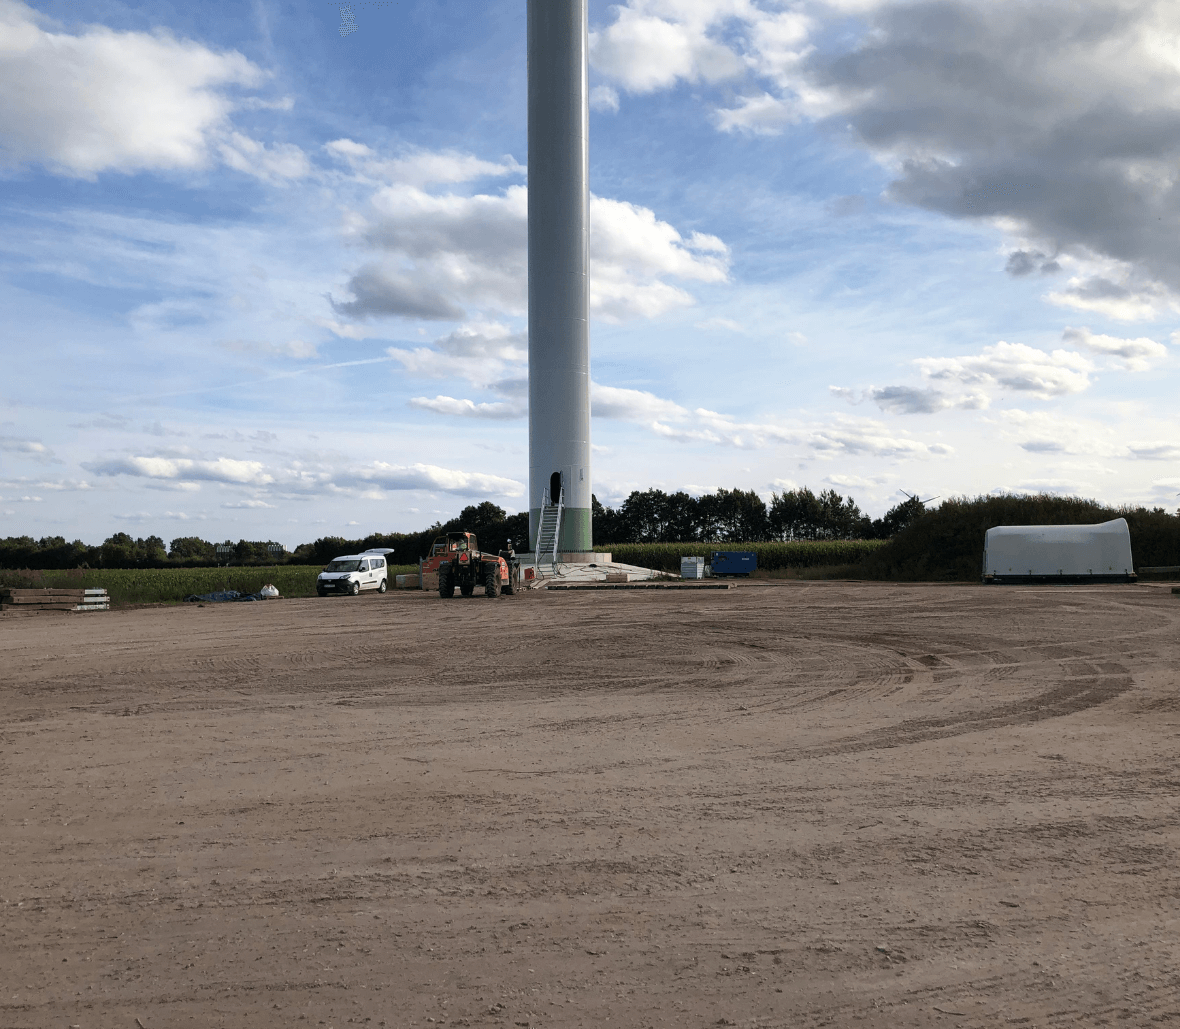 Windmill park-soil stabilizaion by EnkaGrid geogrid_copyrights Low & Bonar_Enka Solutions (2)